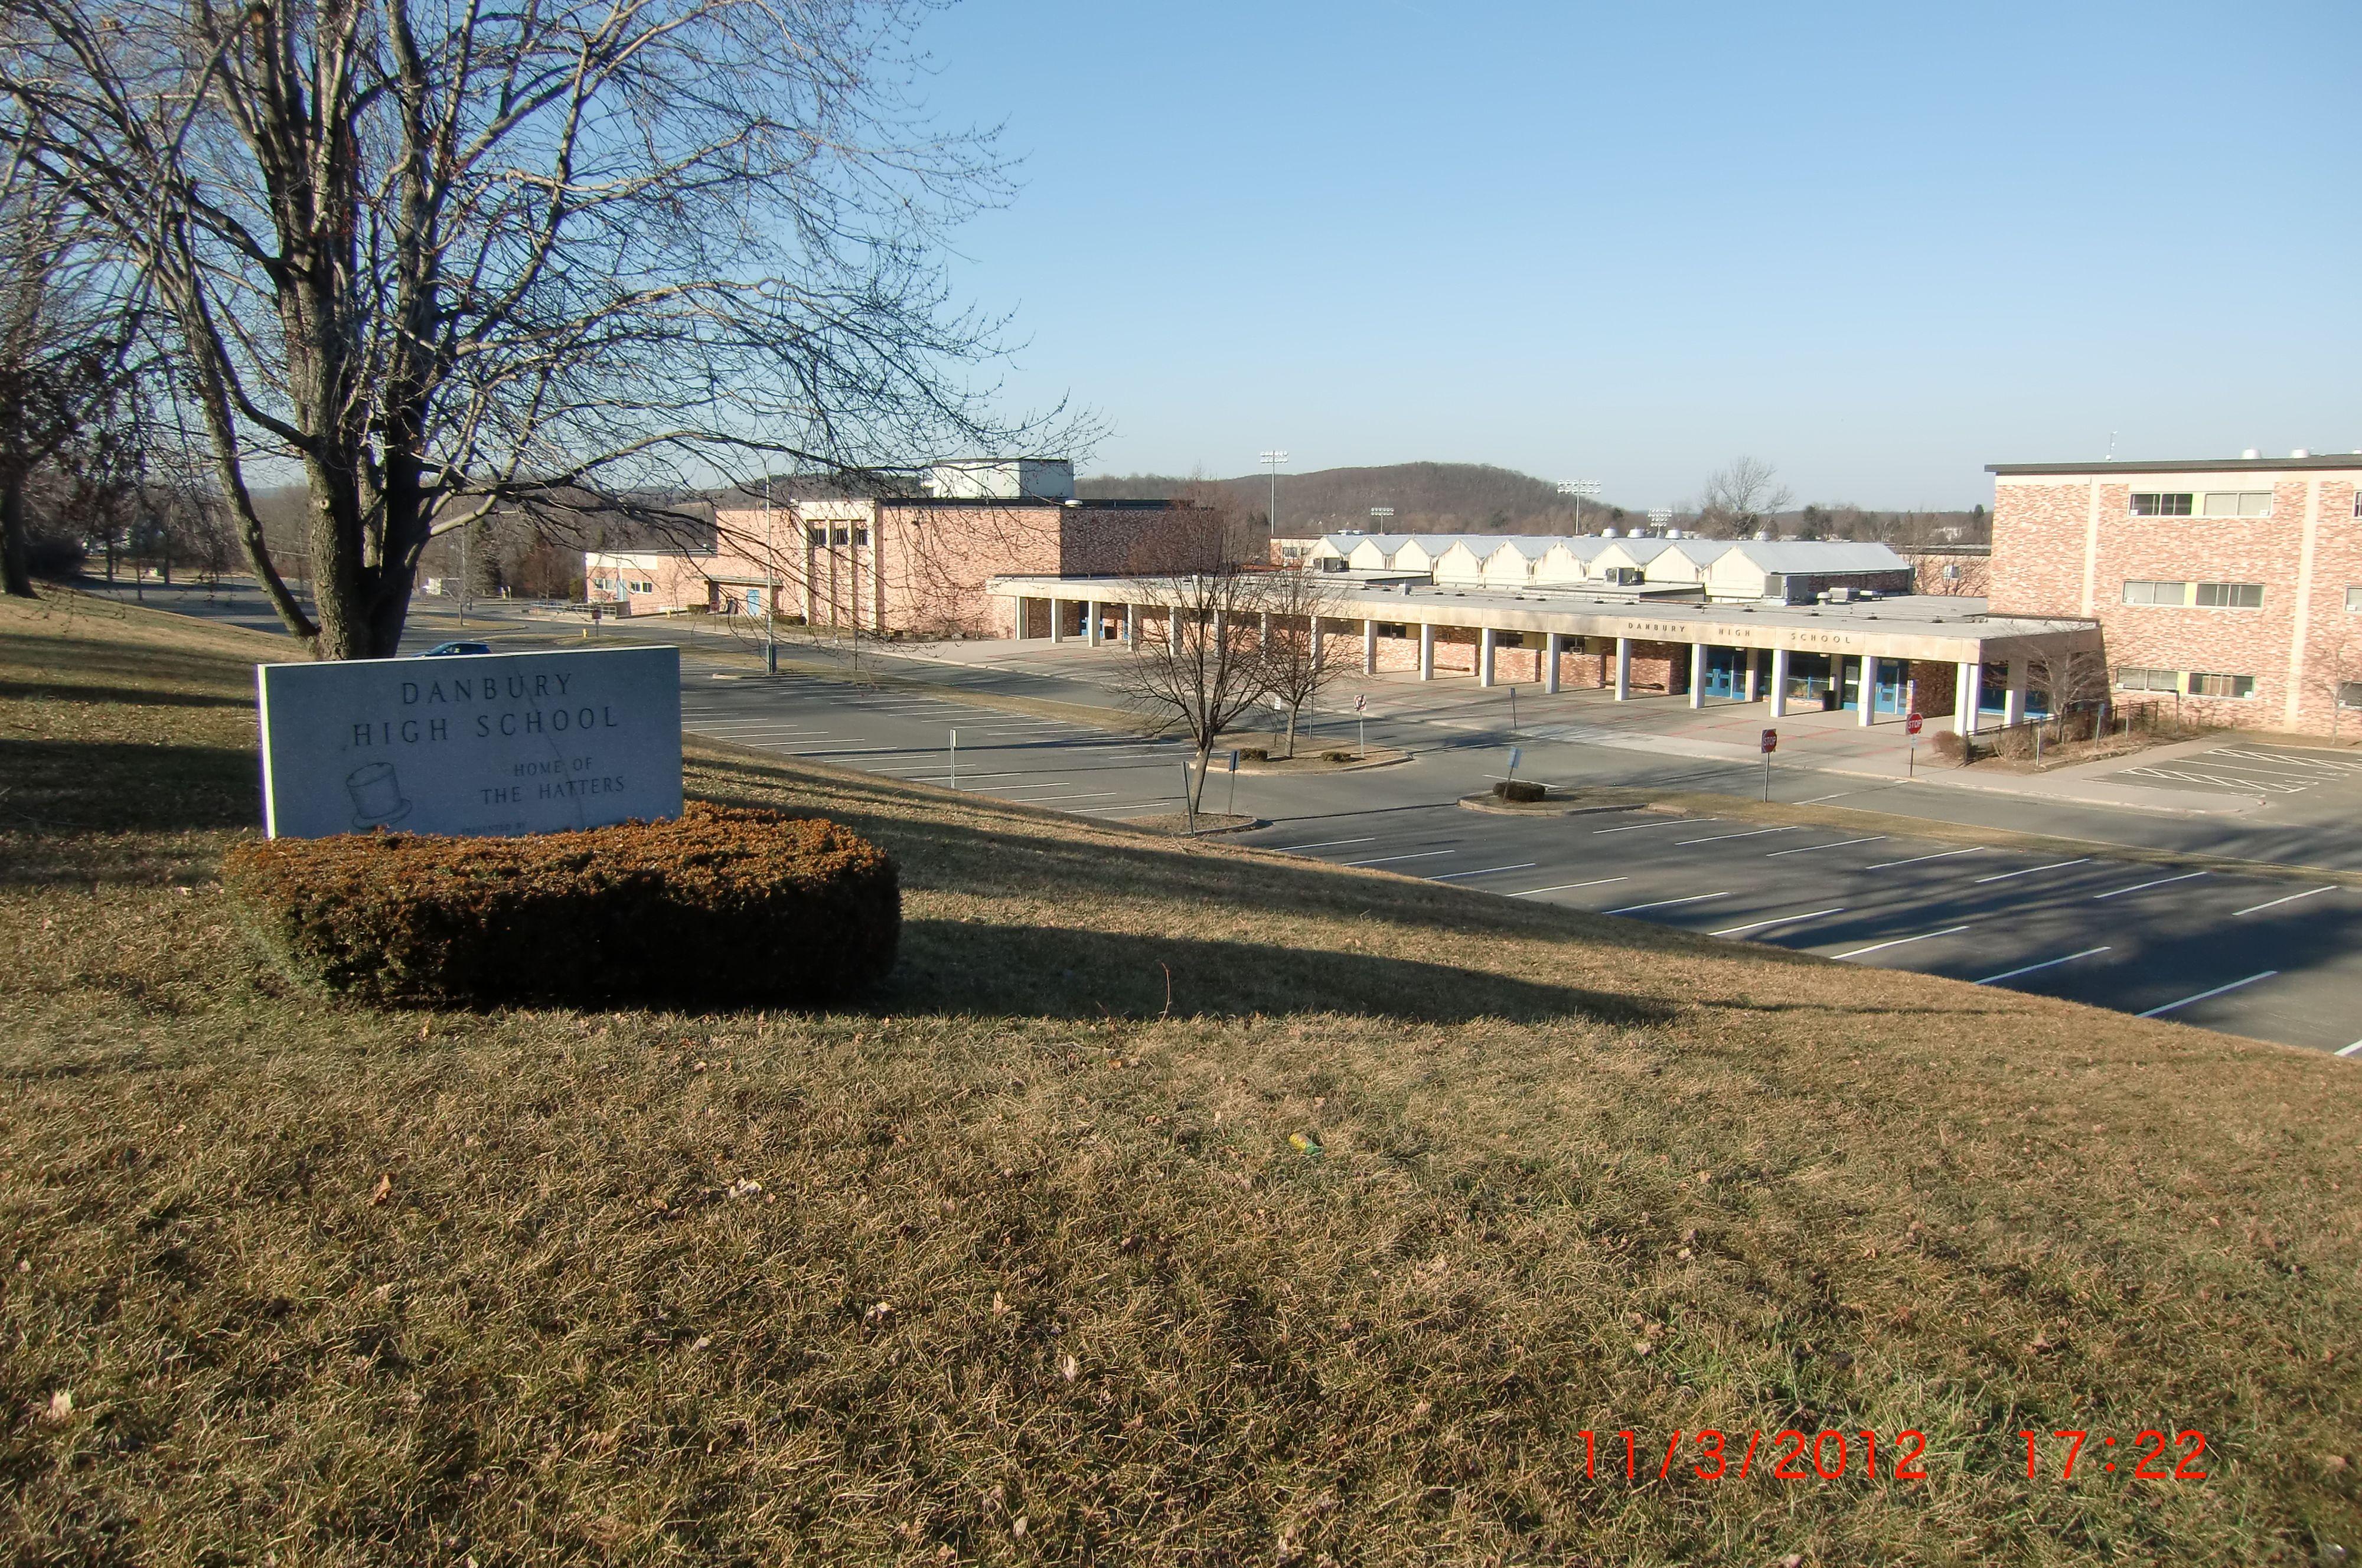 Danbury High School, Clapboard Ridge, Danbury, CT opened